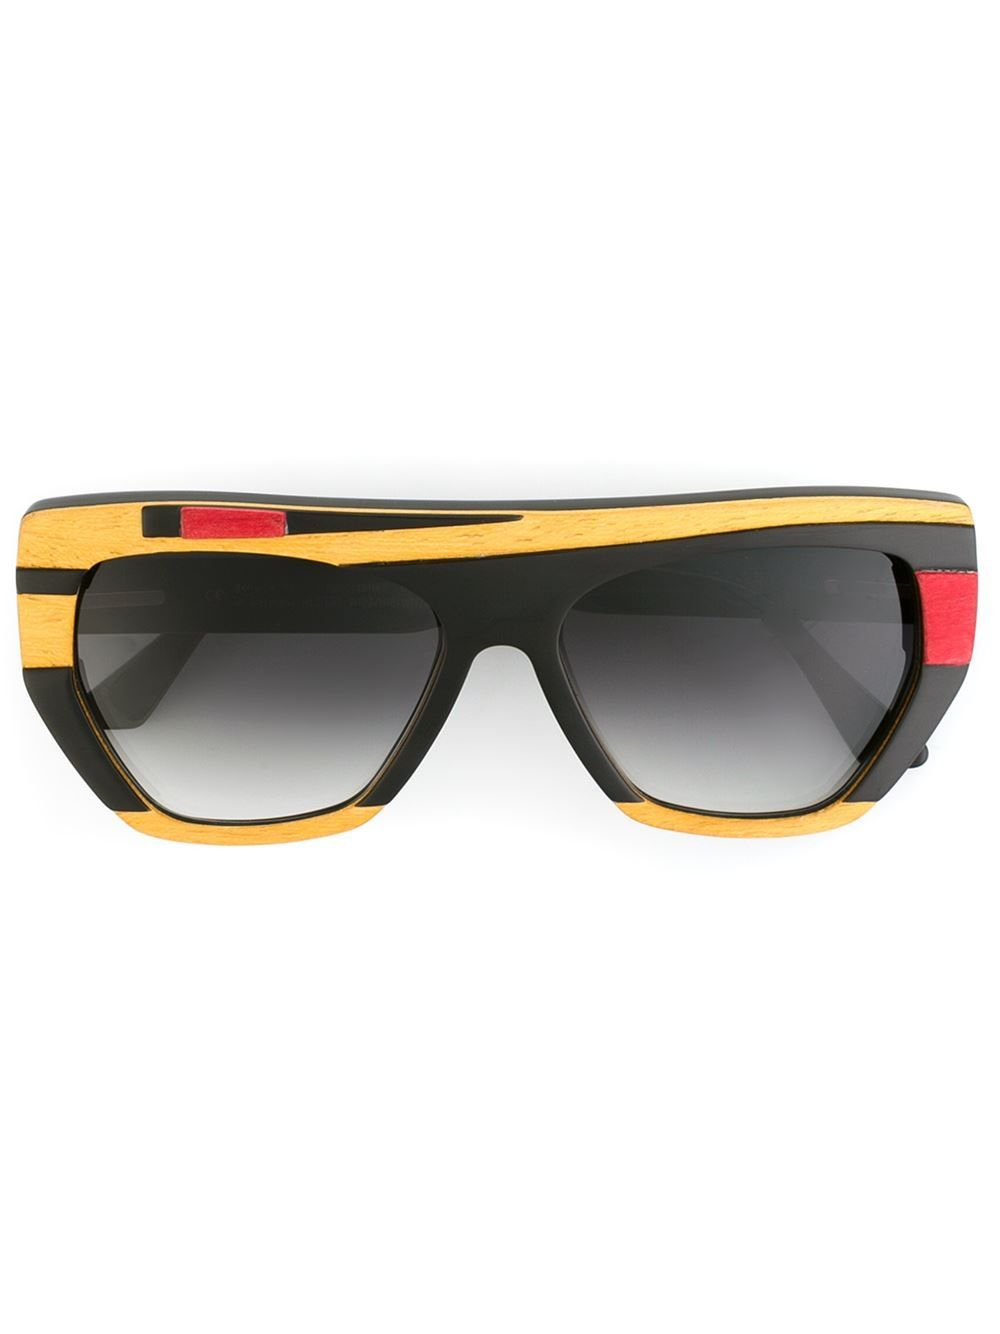 8c8cbd5a524 Ralph Vaessen  Hubert  Sunglasses